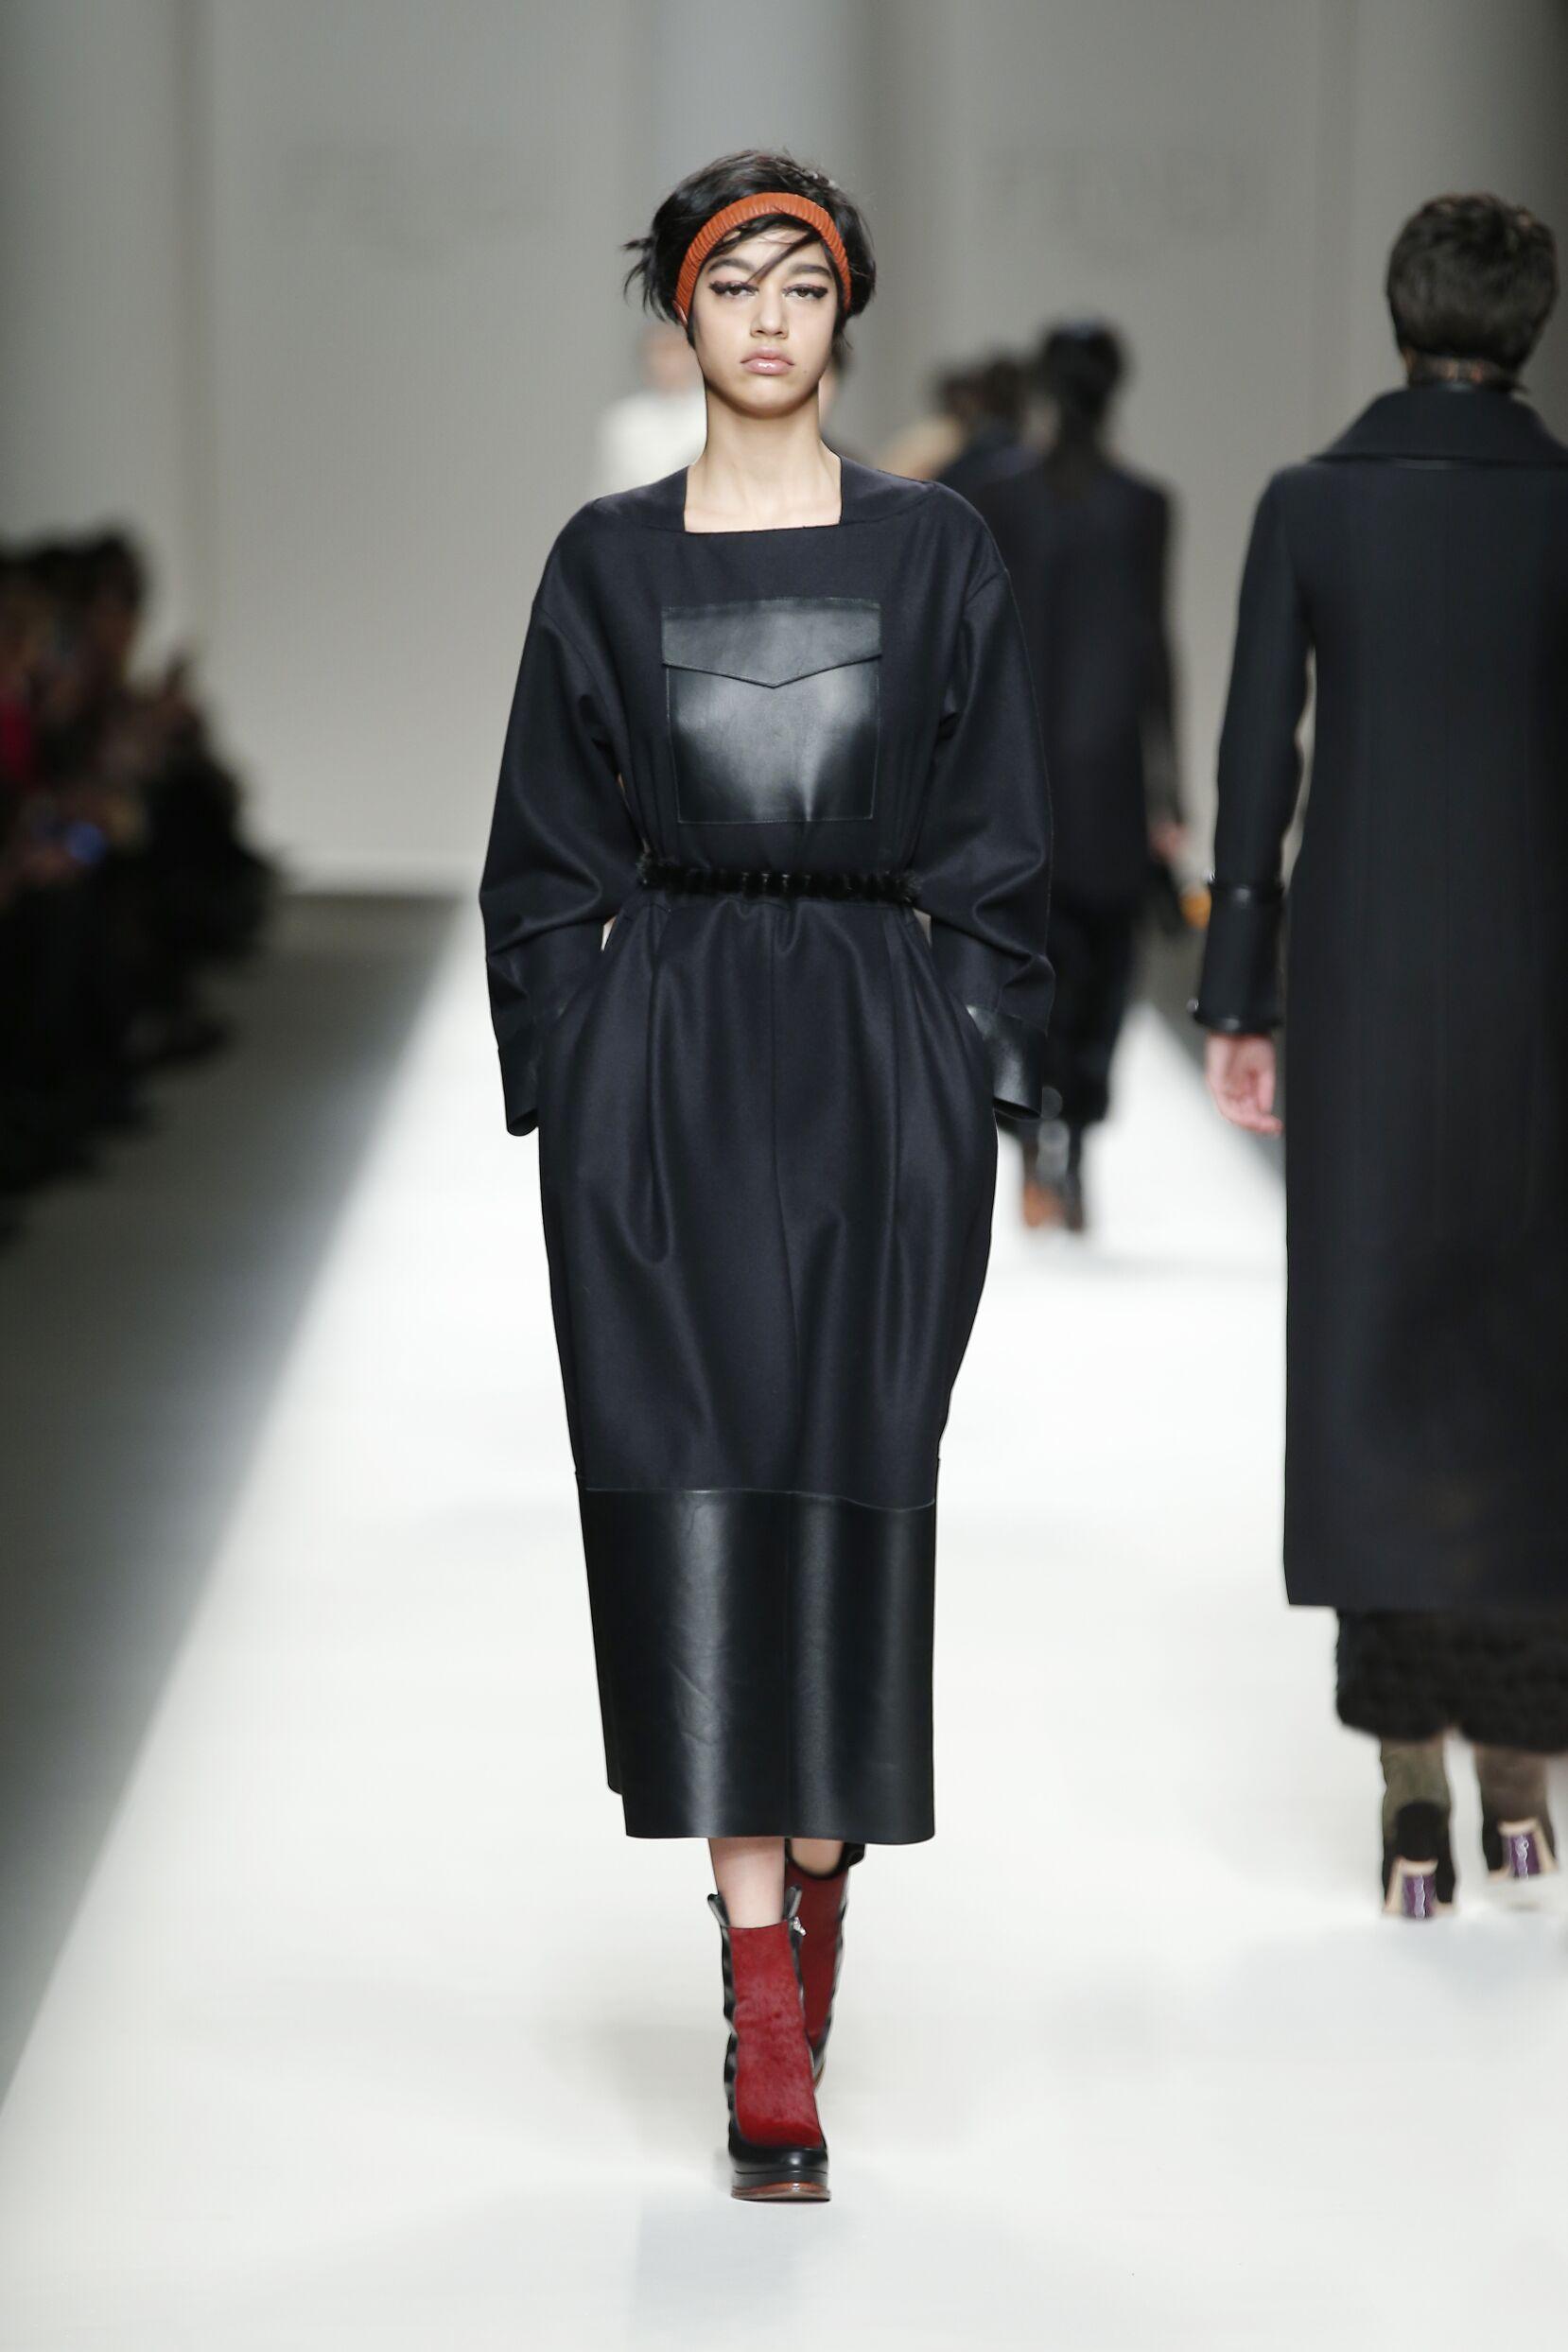 Winter Fashion Trends 2015 2016 Fendi Collection